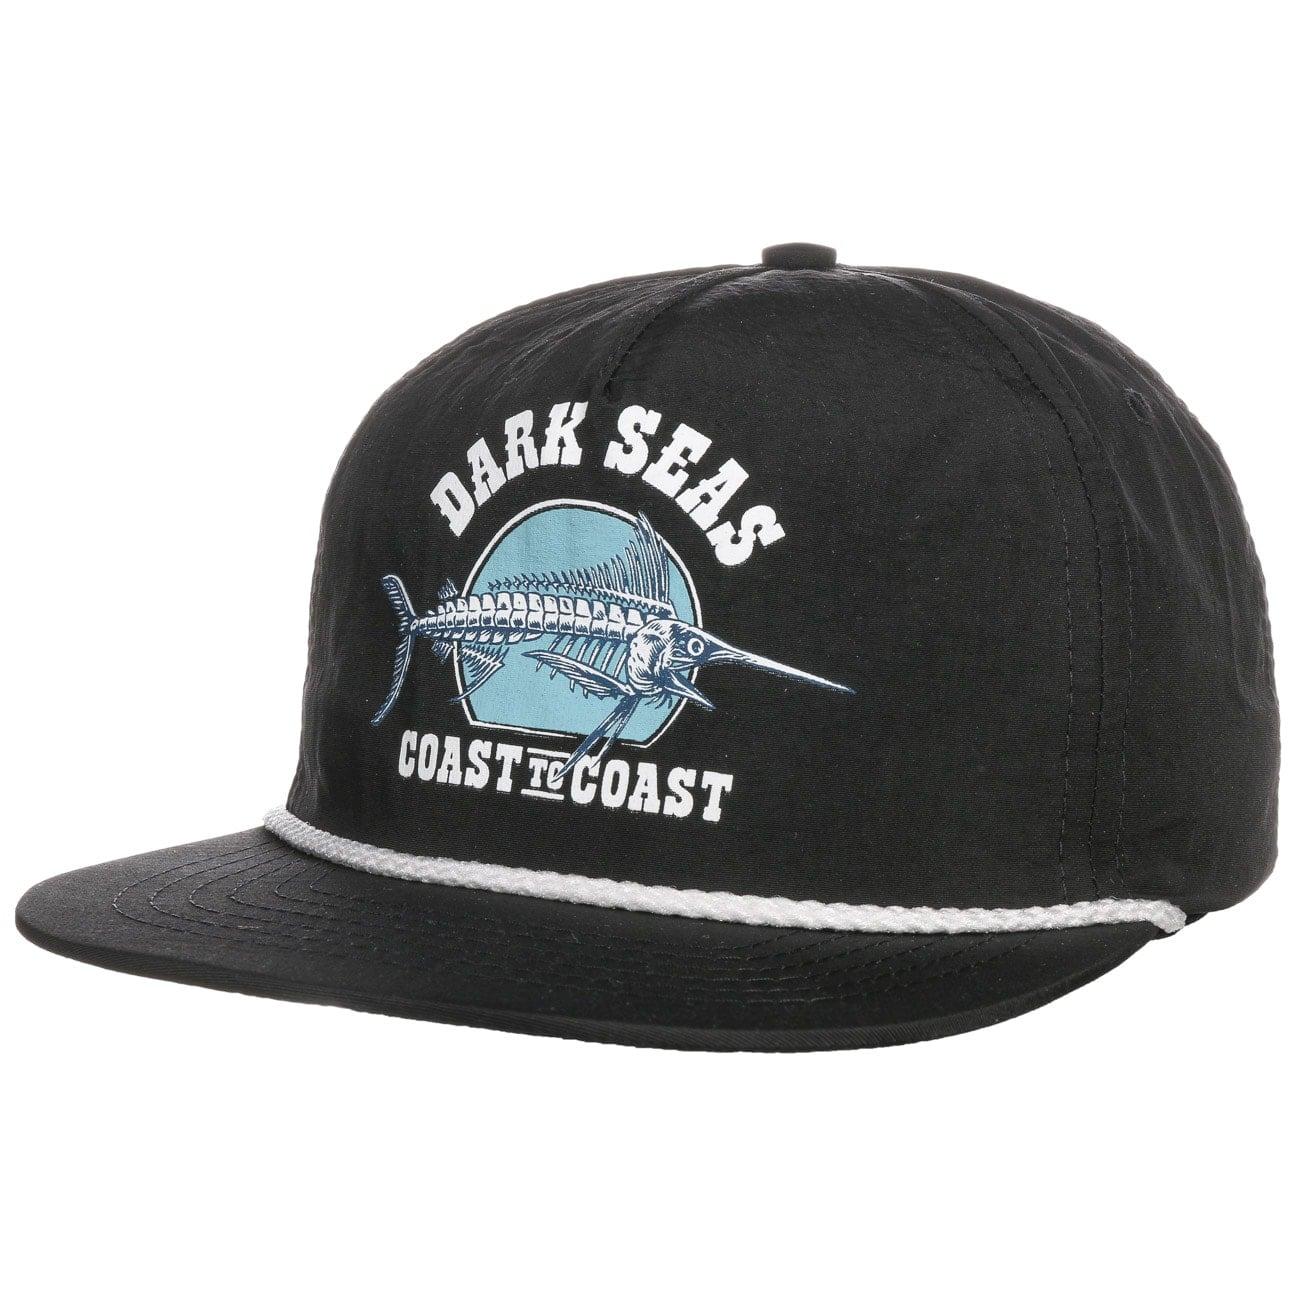 Casquette Snapback Black Jack by Dark Seas  casquette visière plate